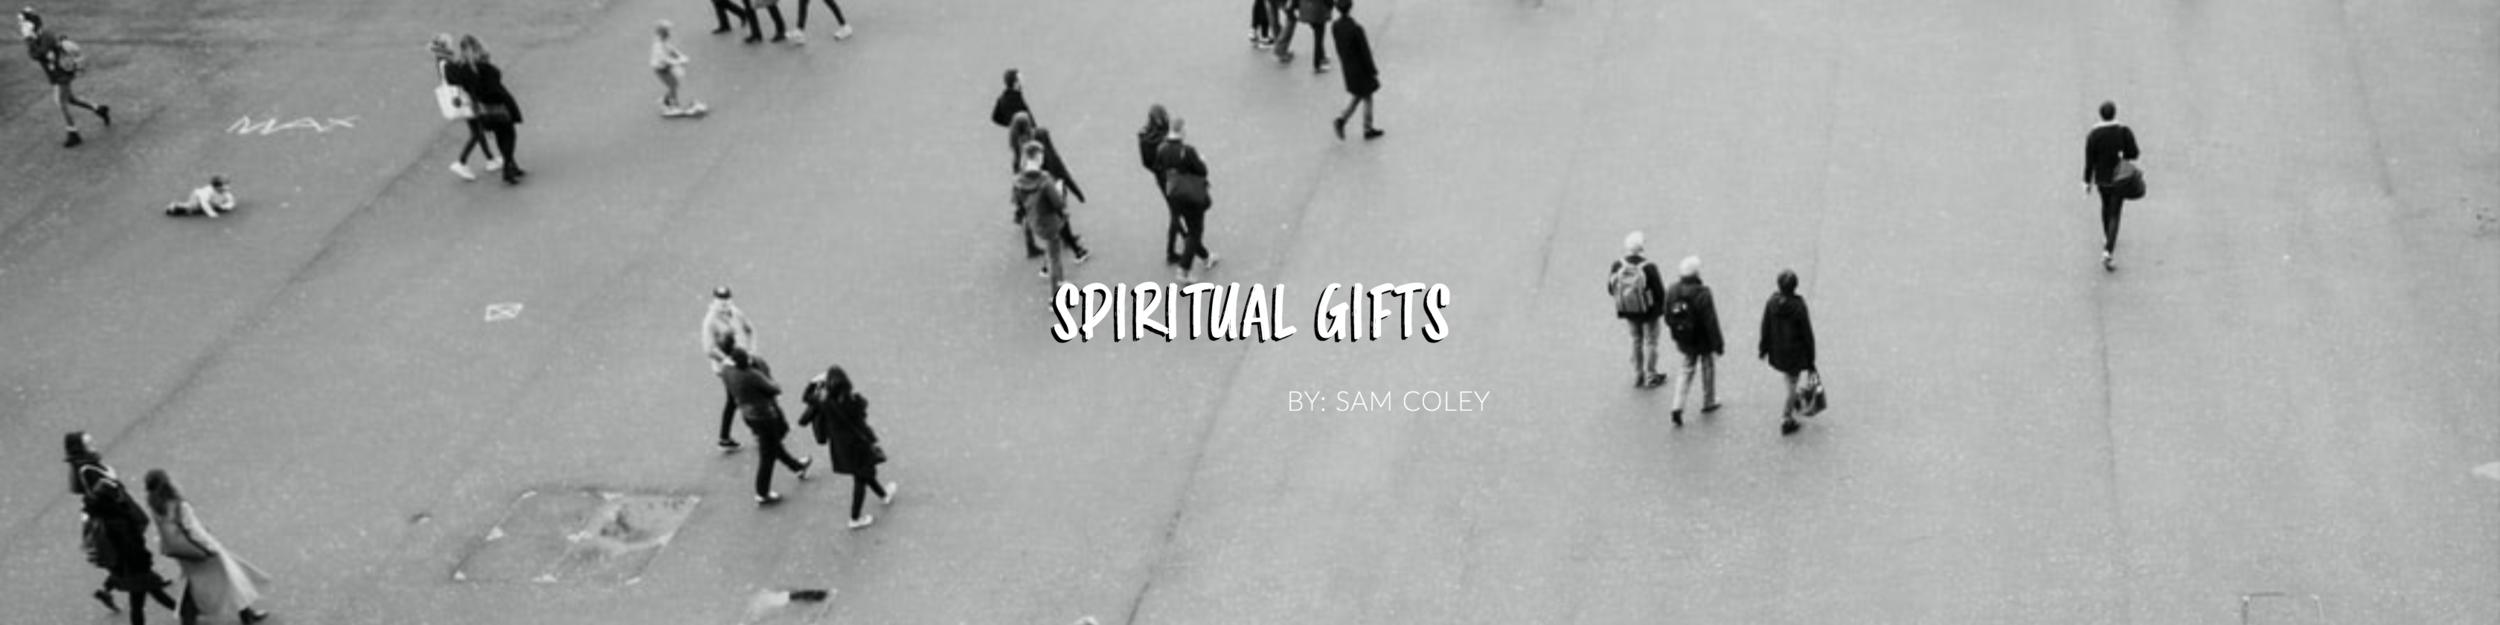 Spiritual Gifts Smoothy.png